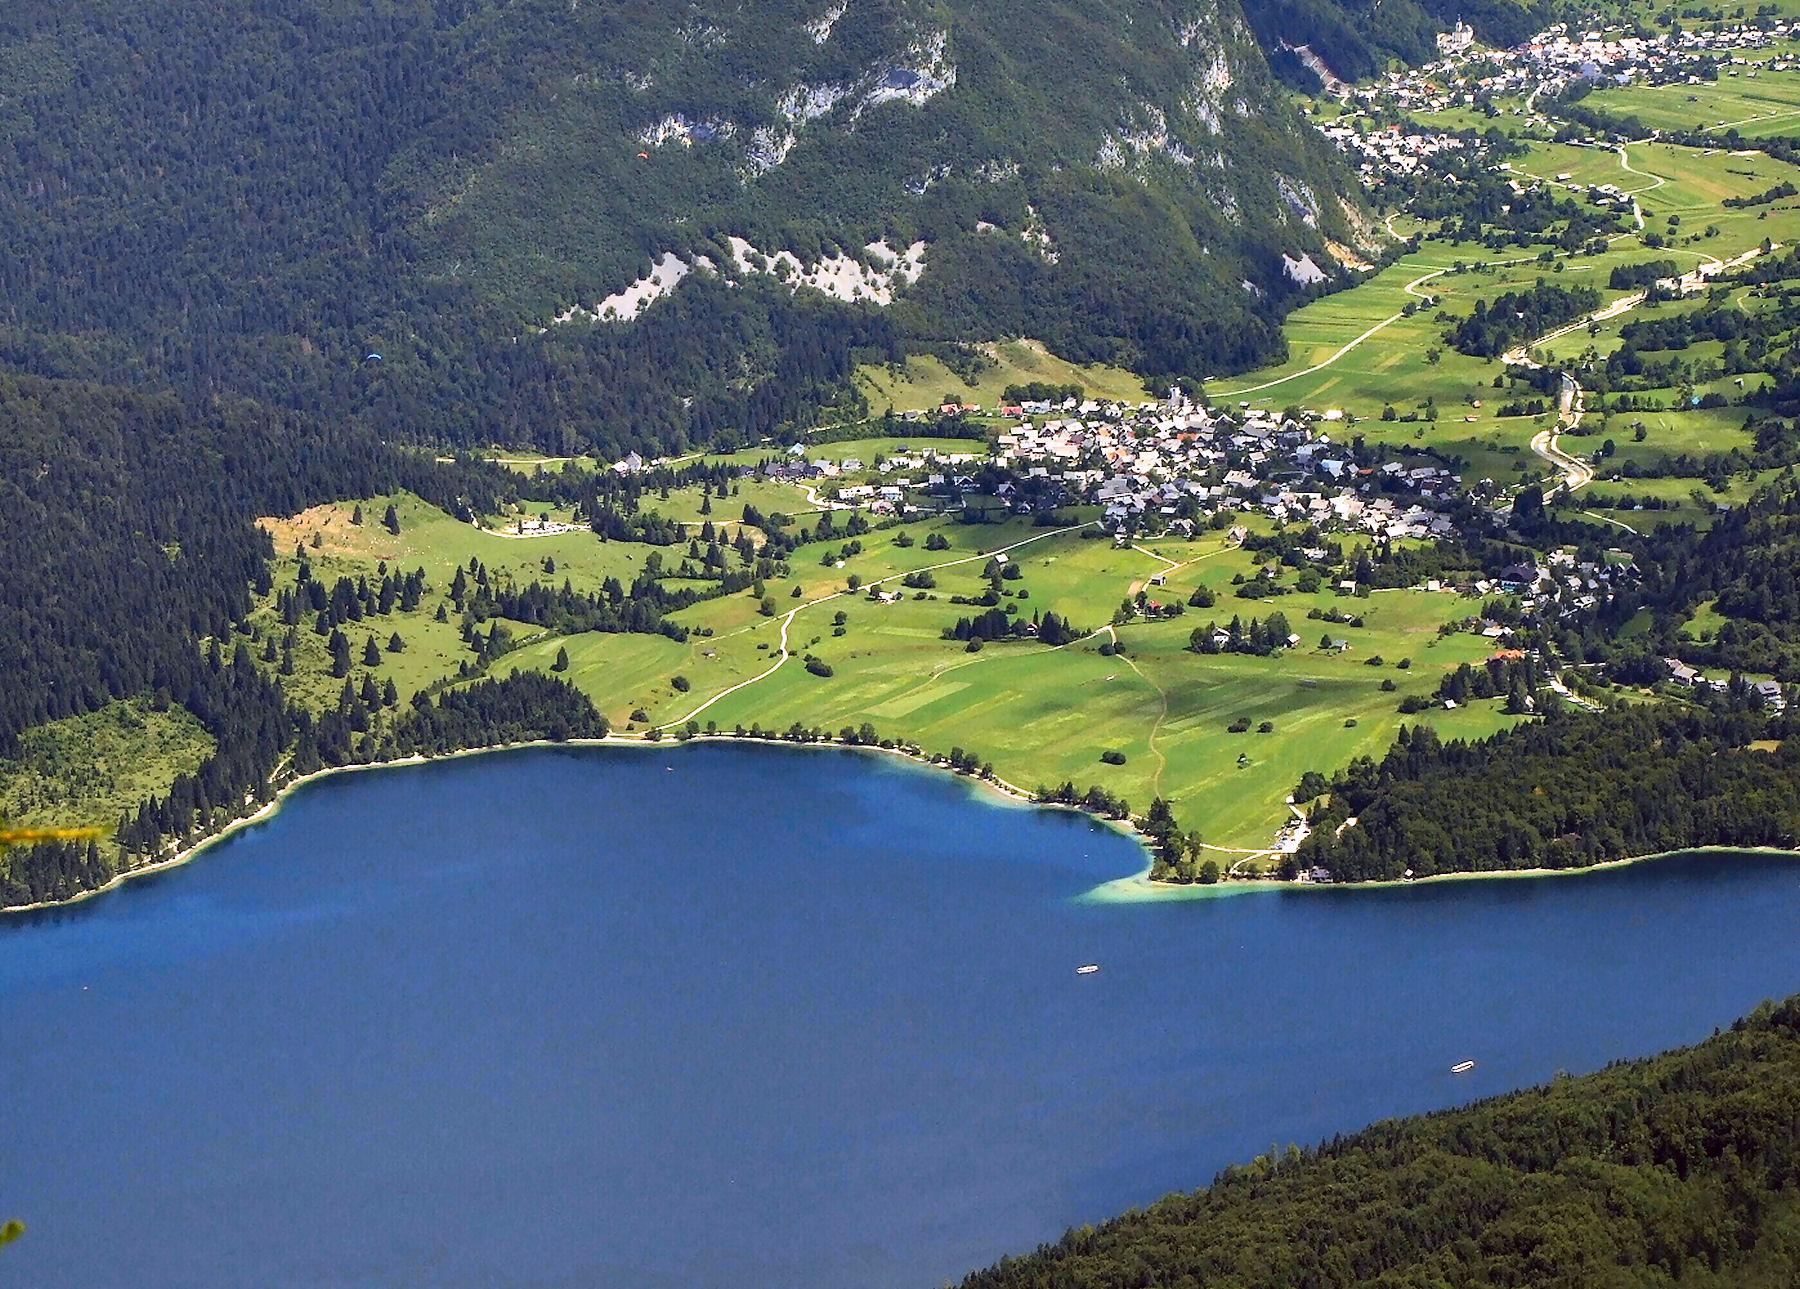 View on Lake Bohinj from Vogel Mountain